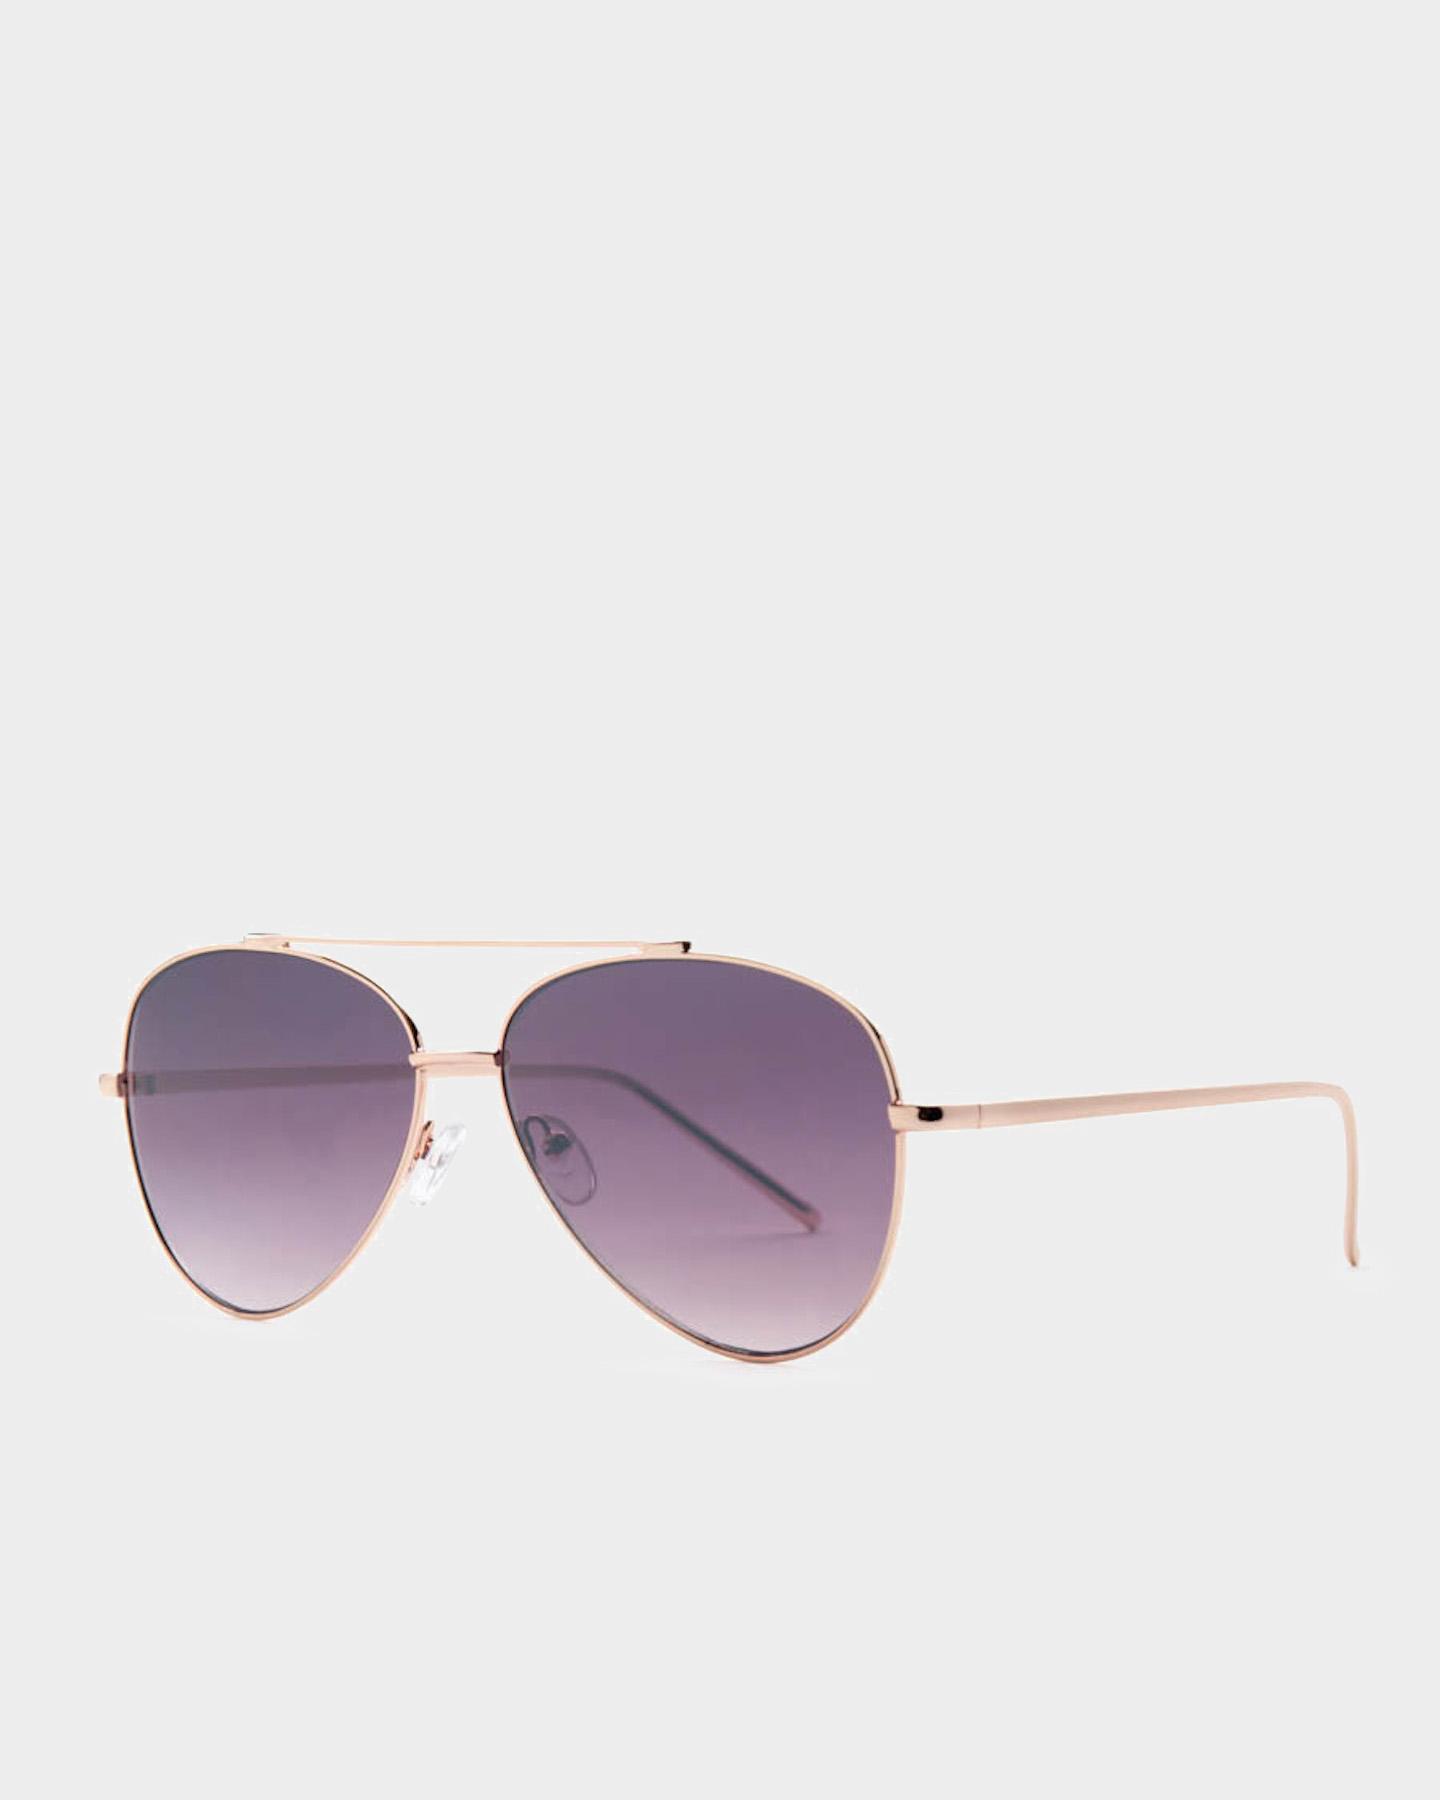 Reality Eyewear Mr Chip Sunglasses Rose Gold